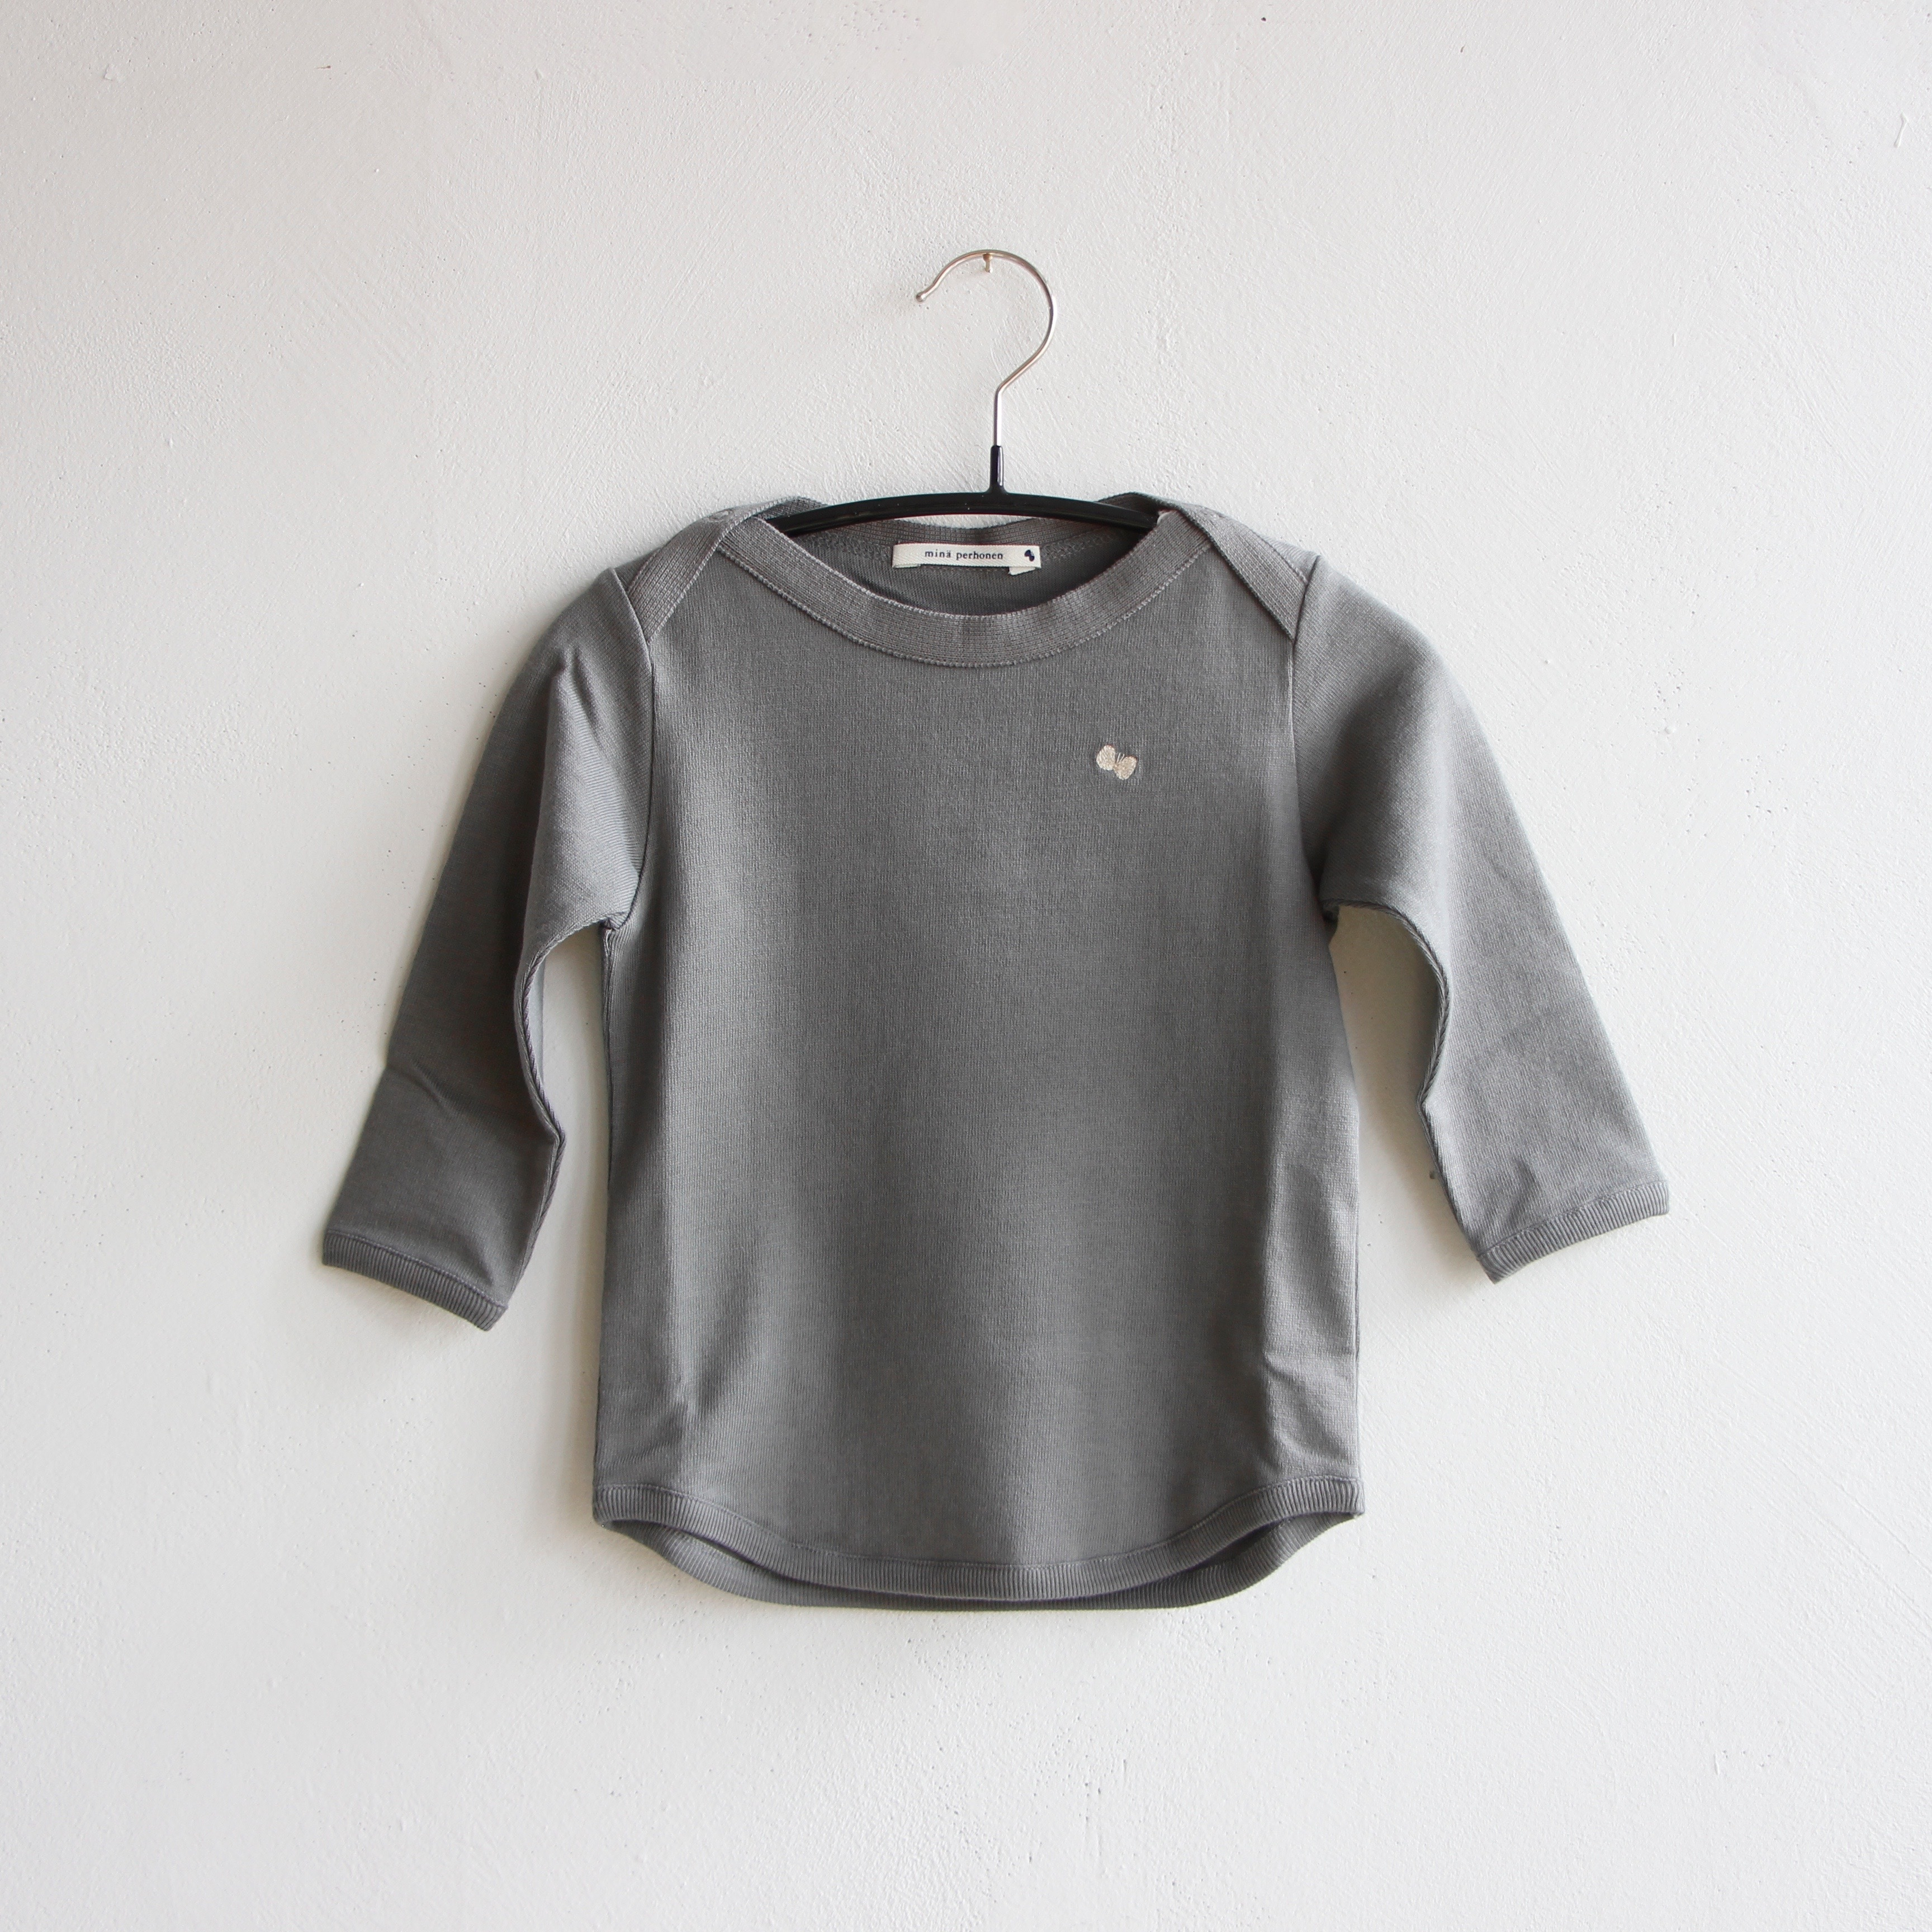 《mina perhonen 2020AW》zutto 長袖カットソー / gray / 110cm